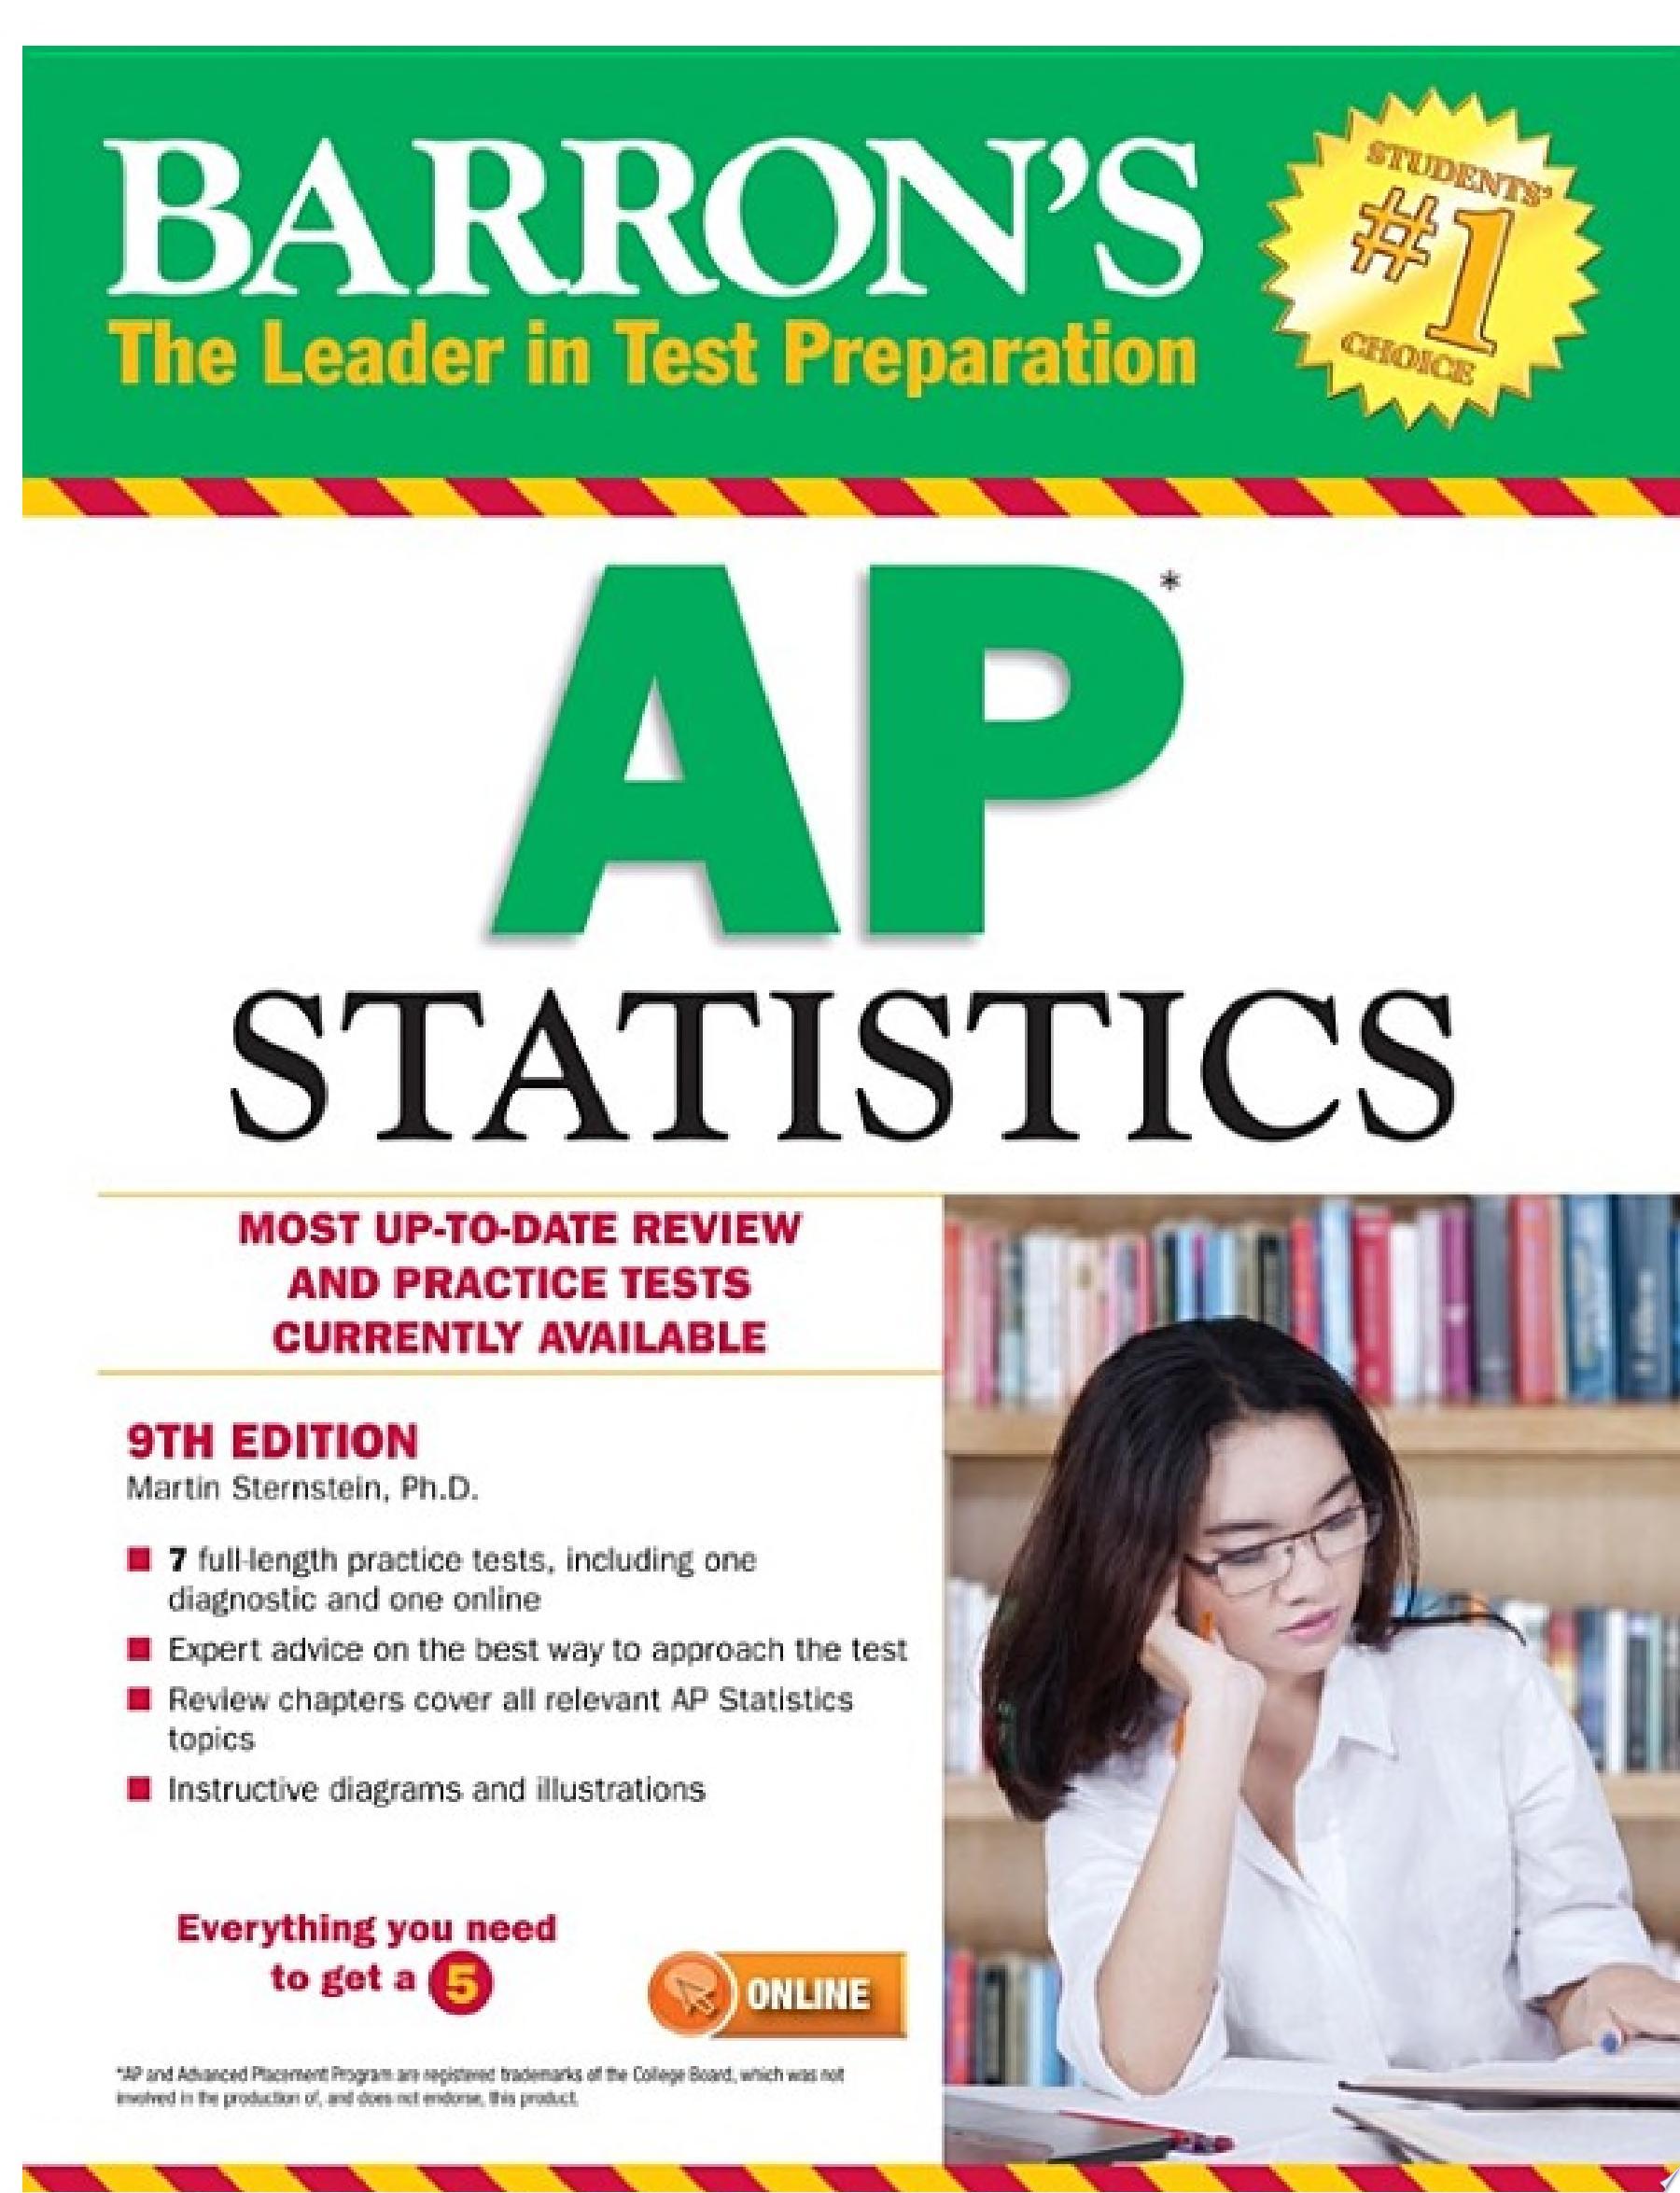 Barron s AP Statistics  9th edition